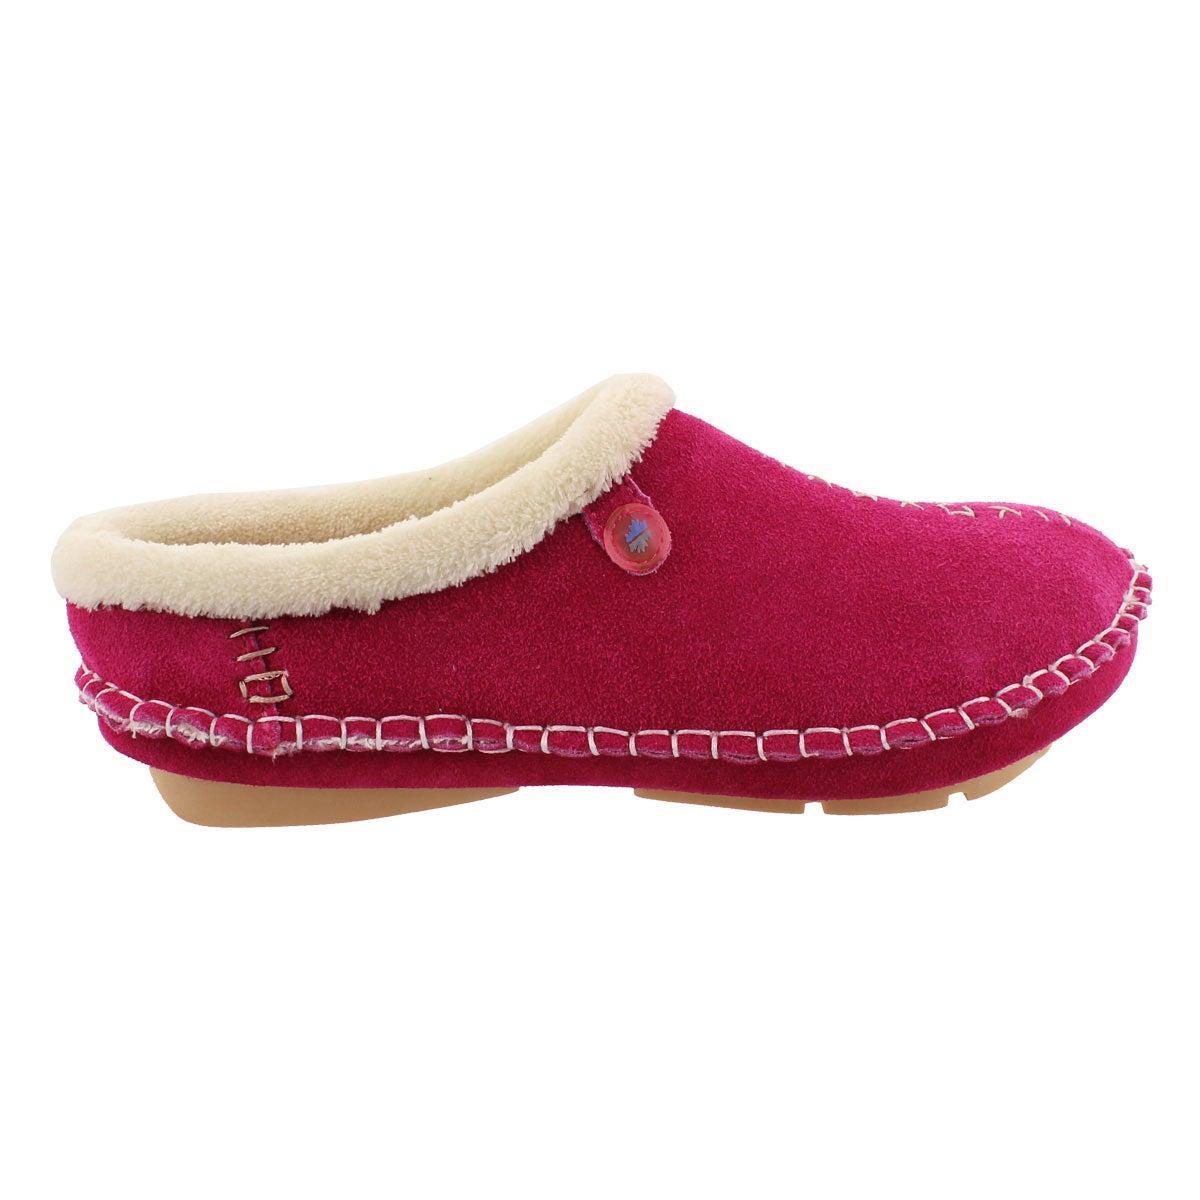 Lds Rosa fuchsia closed back slipper